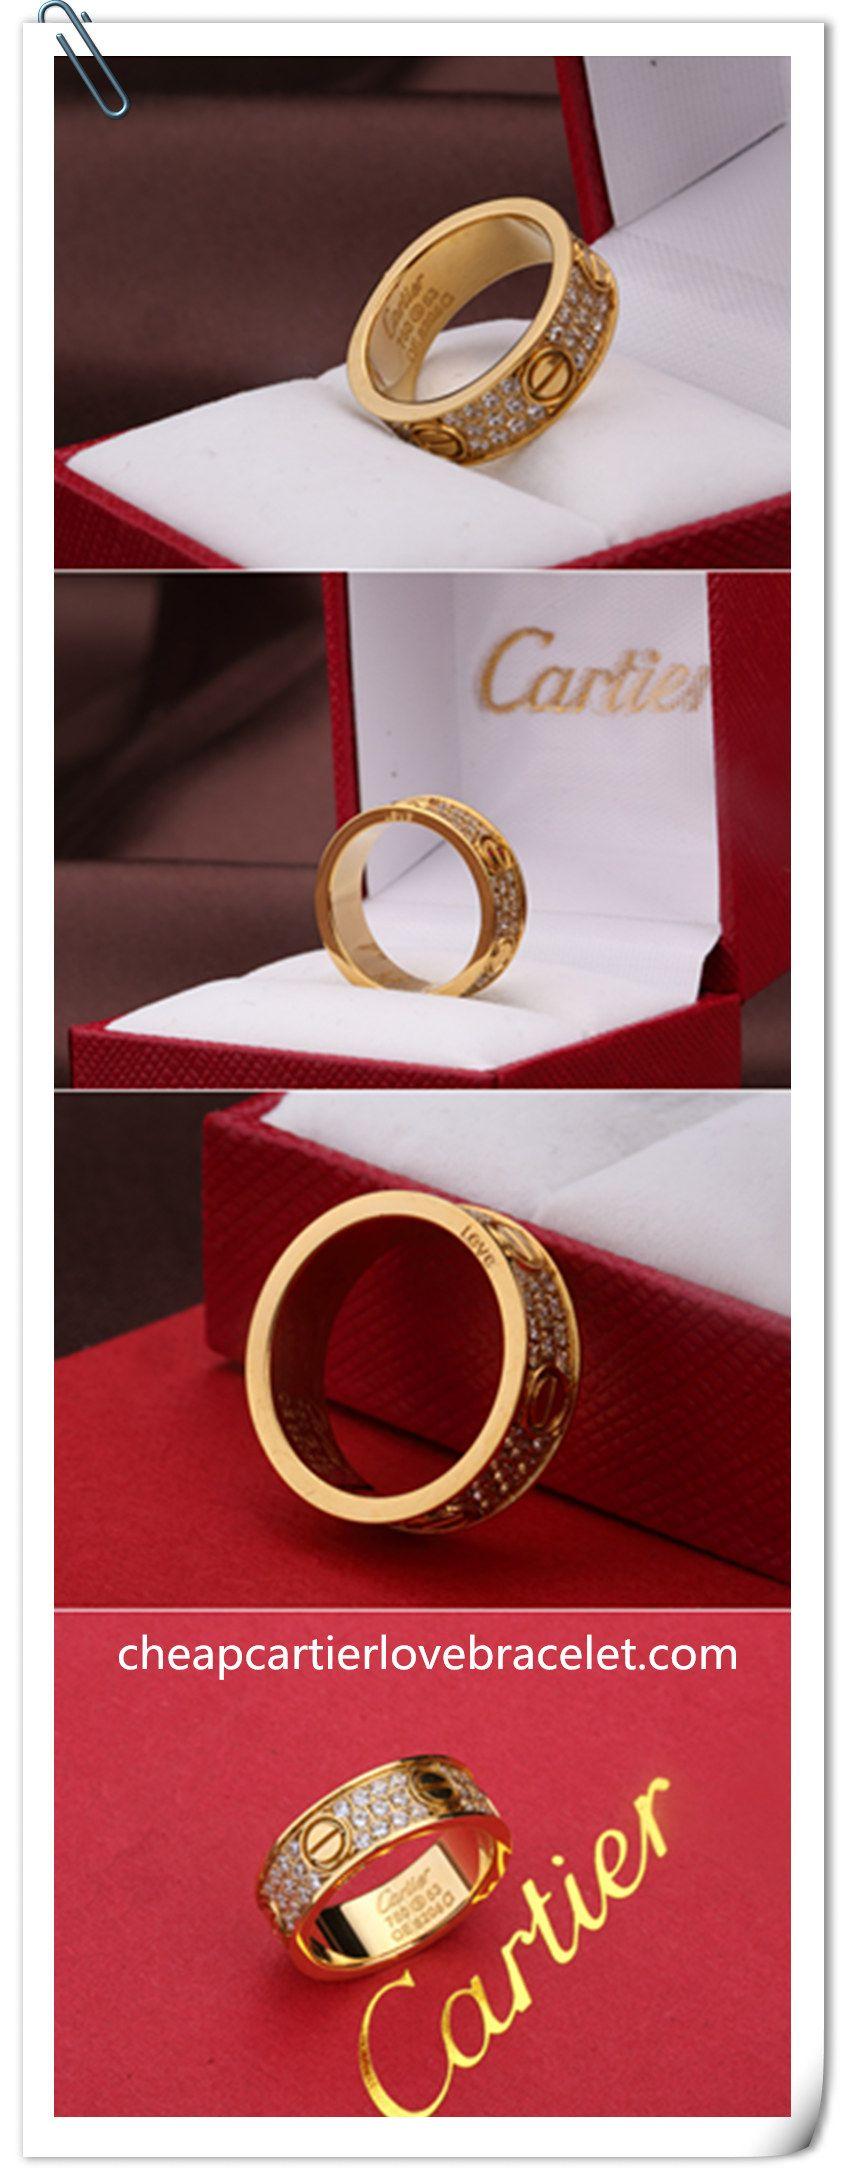 Cartier 18K Yellow Gold Wedding Band Set With Diamonds